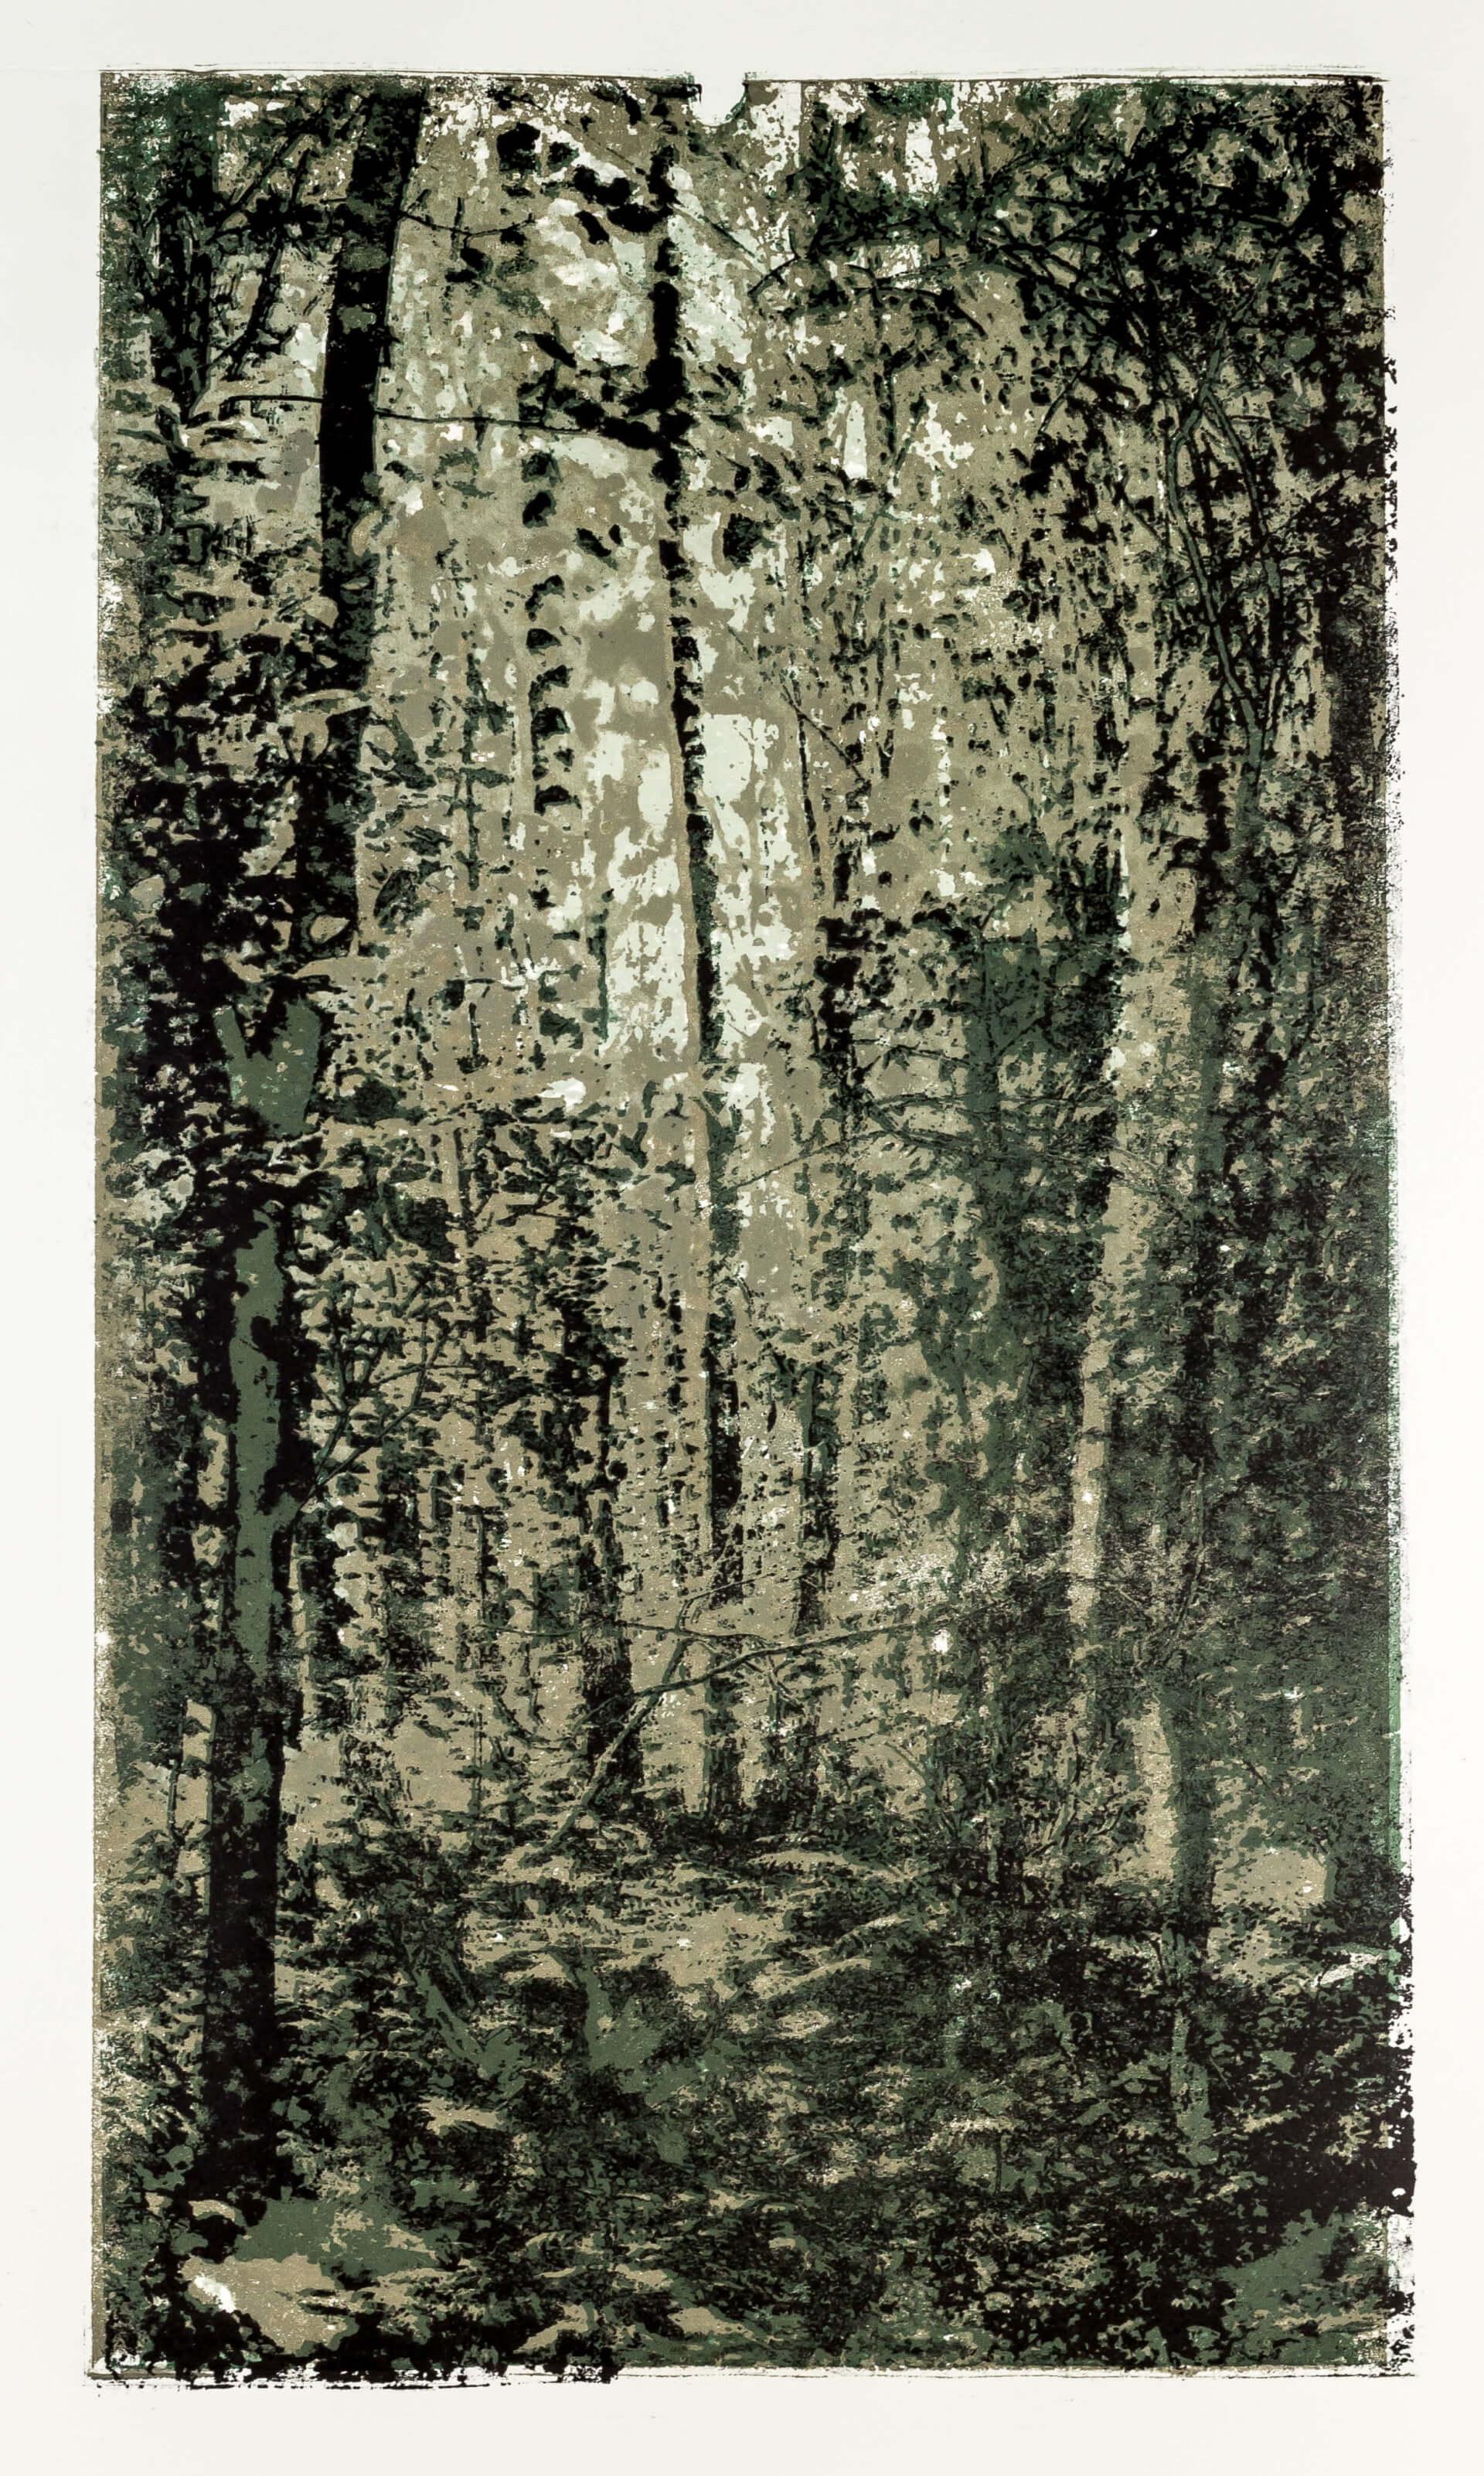 Katharina Albers, Wald XXXIII, 2015, Farblithographie,1 von 2, 60×33 cm